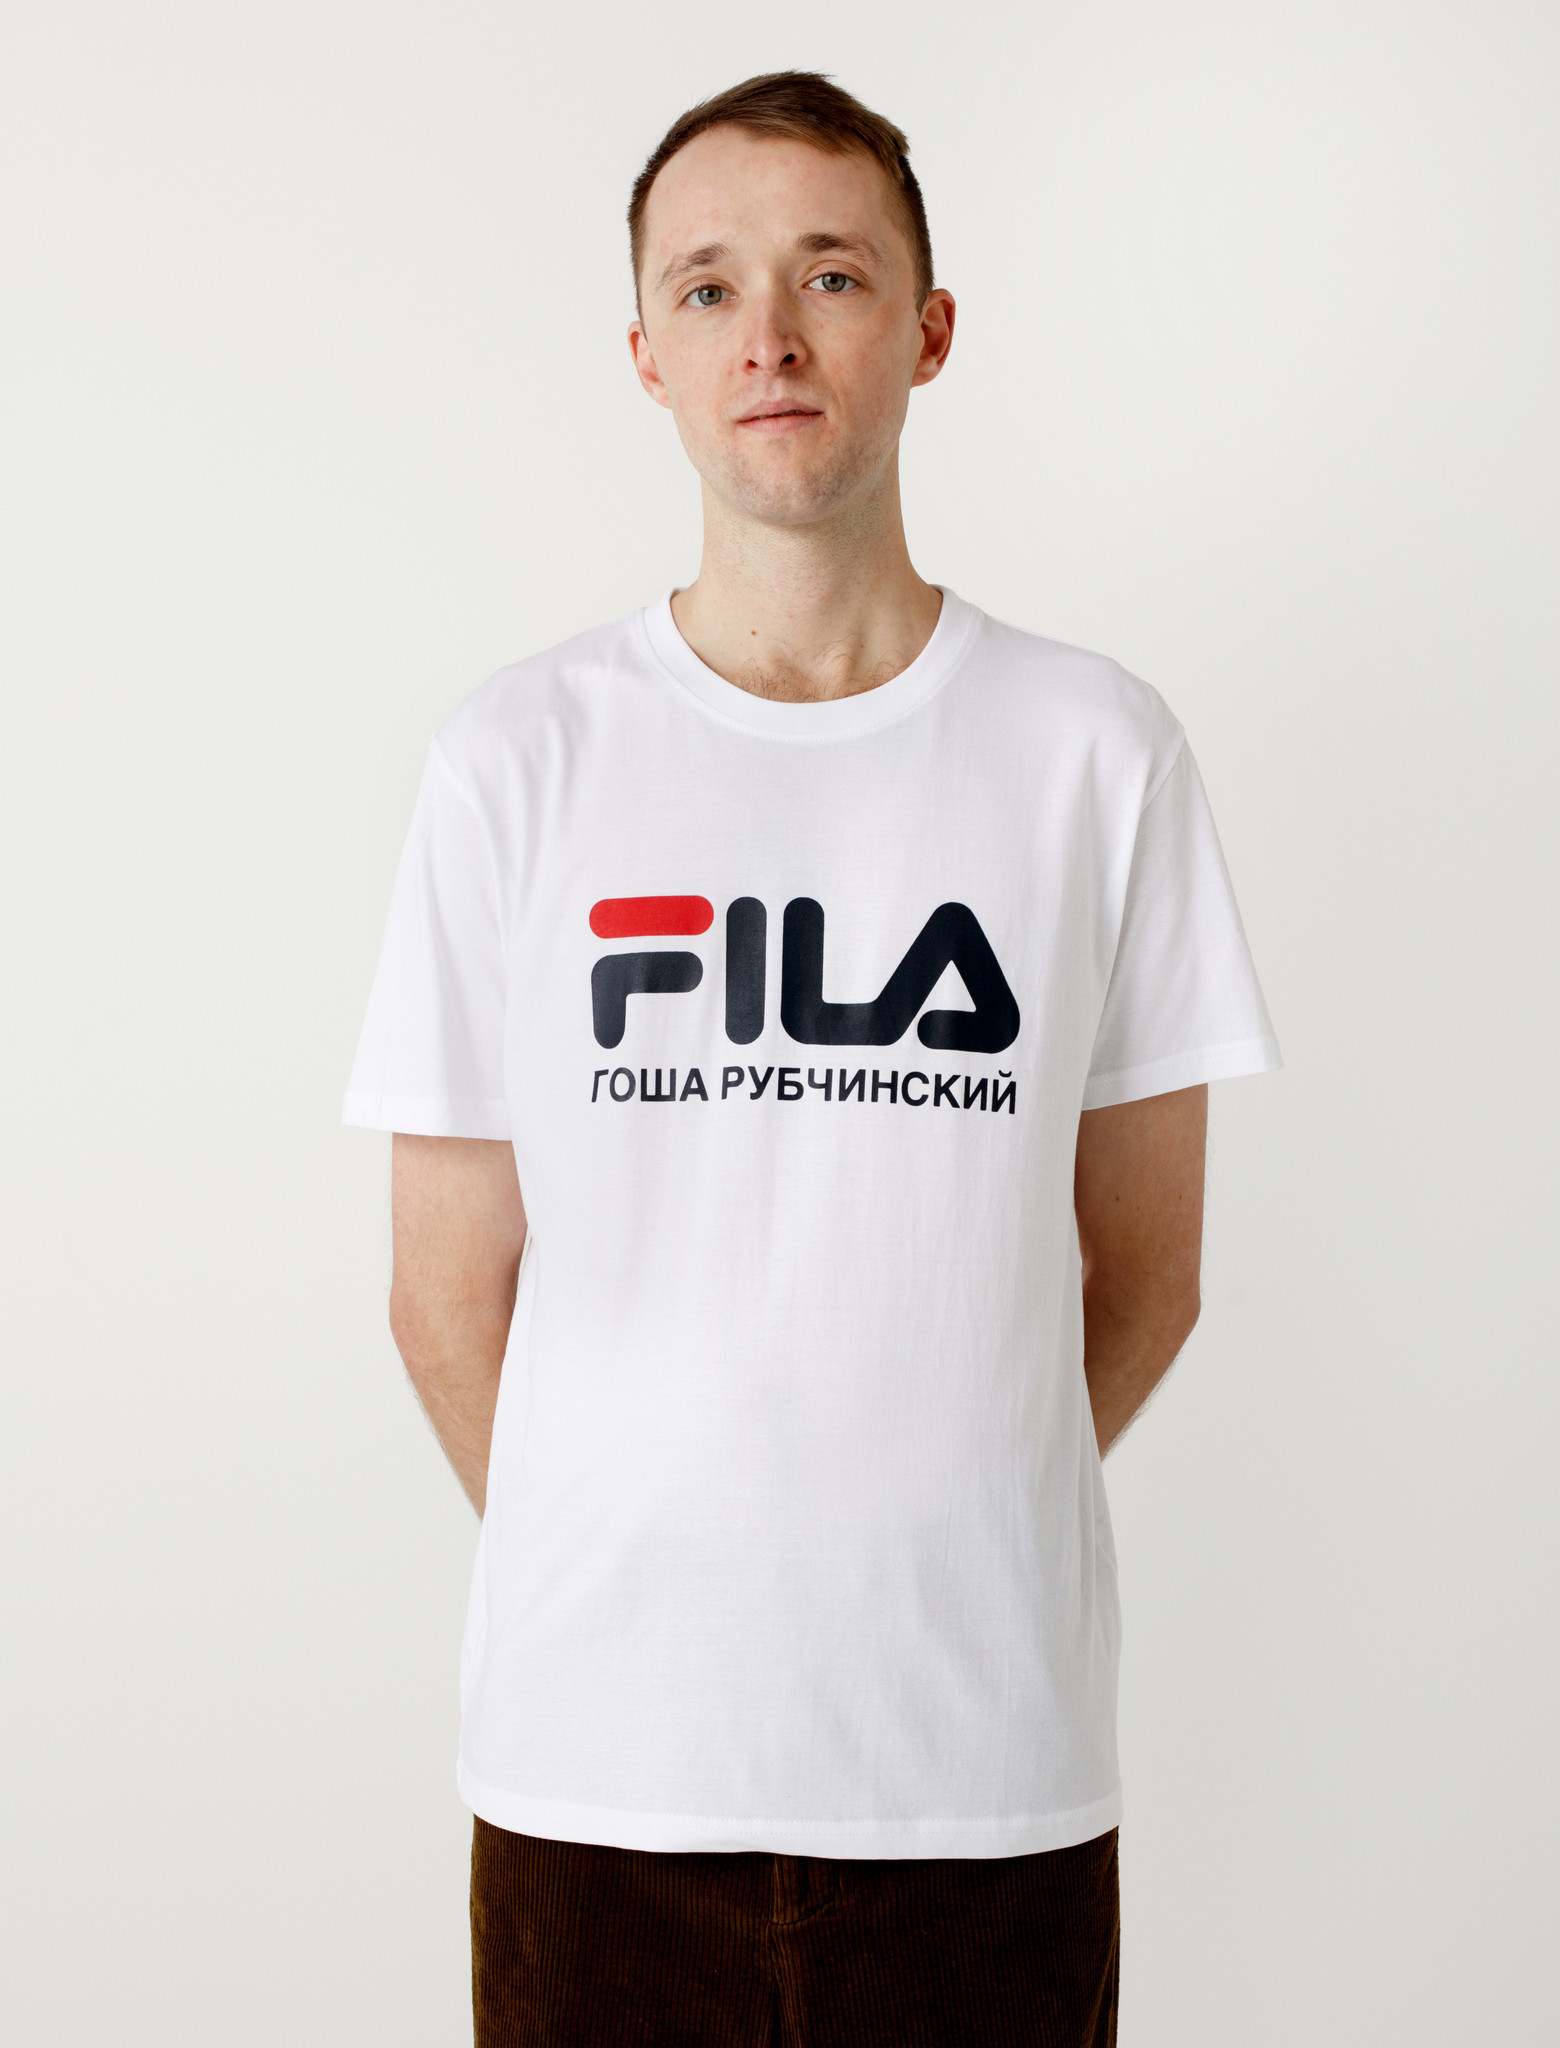 Gosha Rubchinskiy Fila T Shirt White